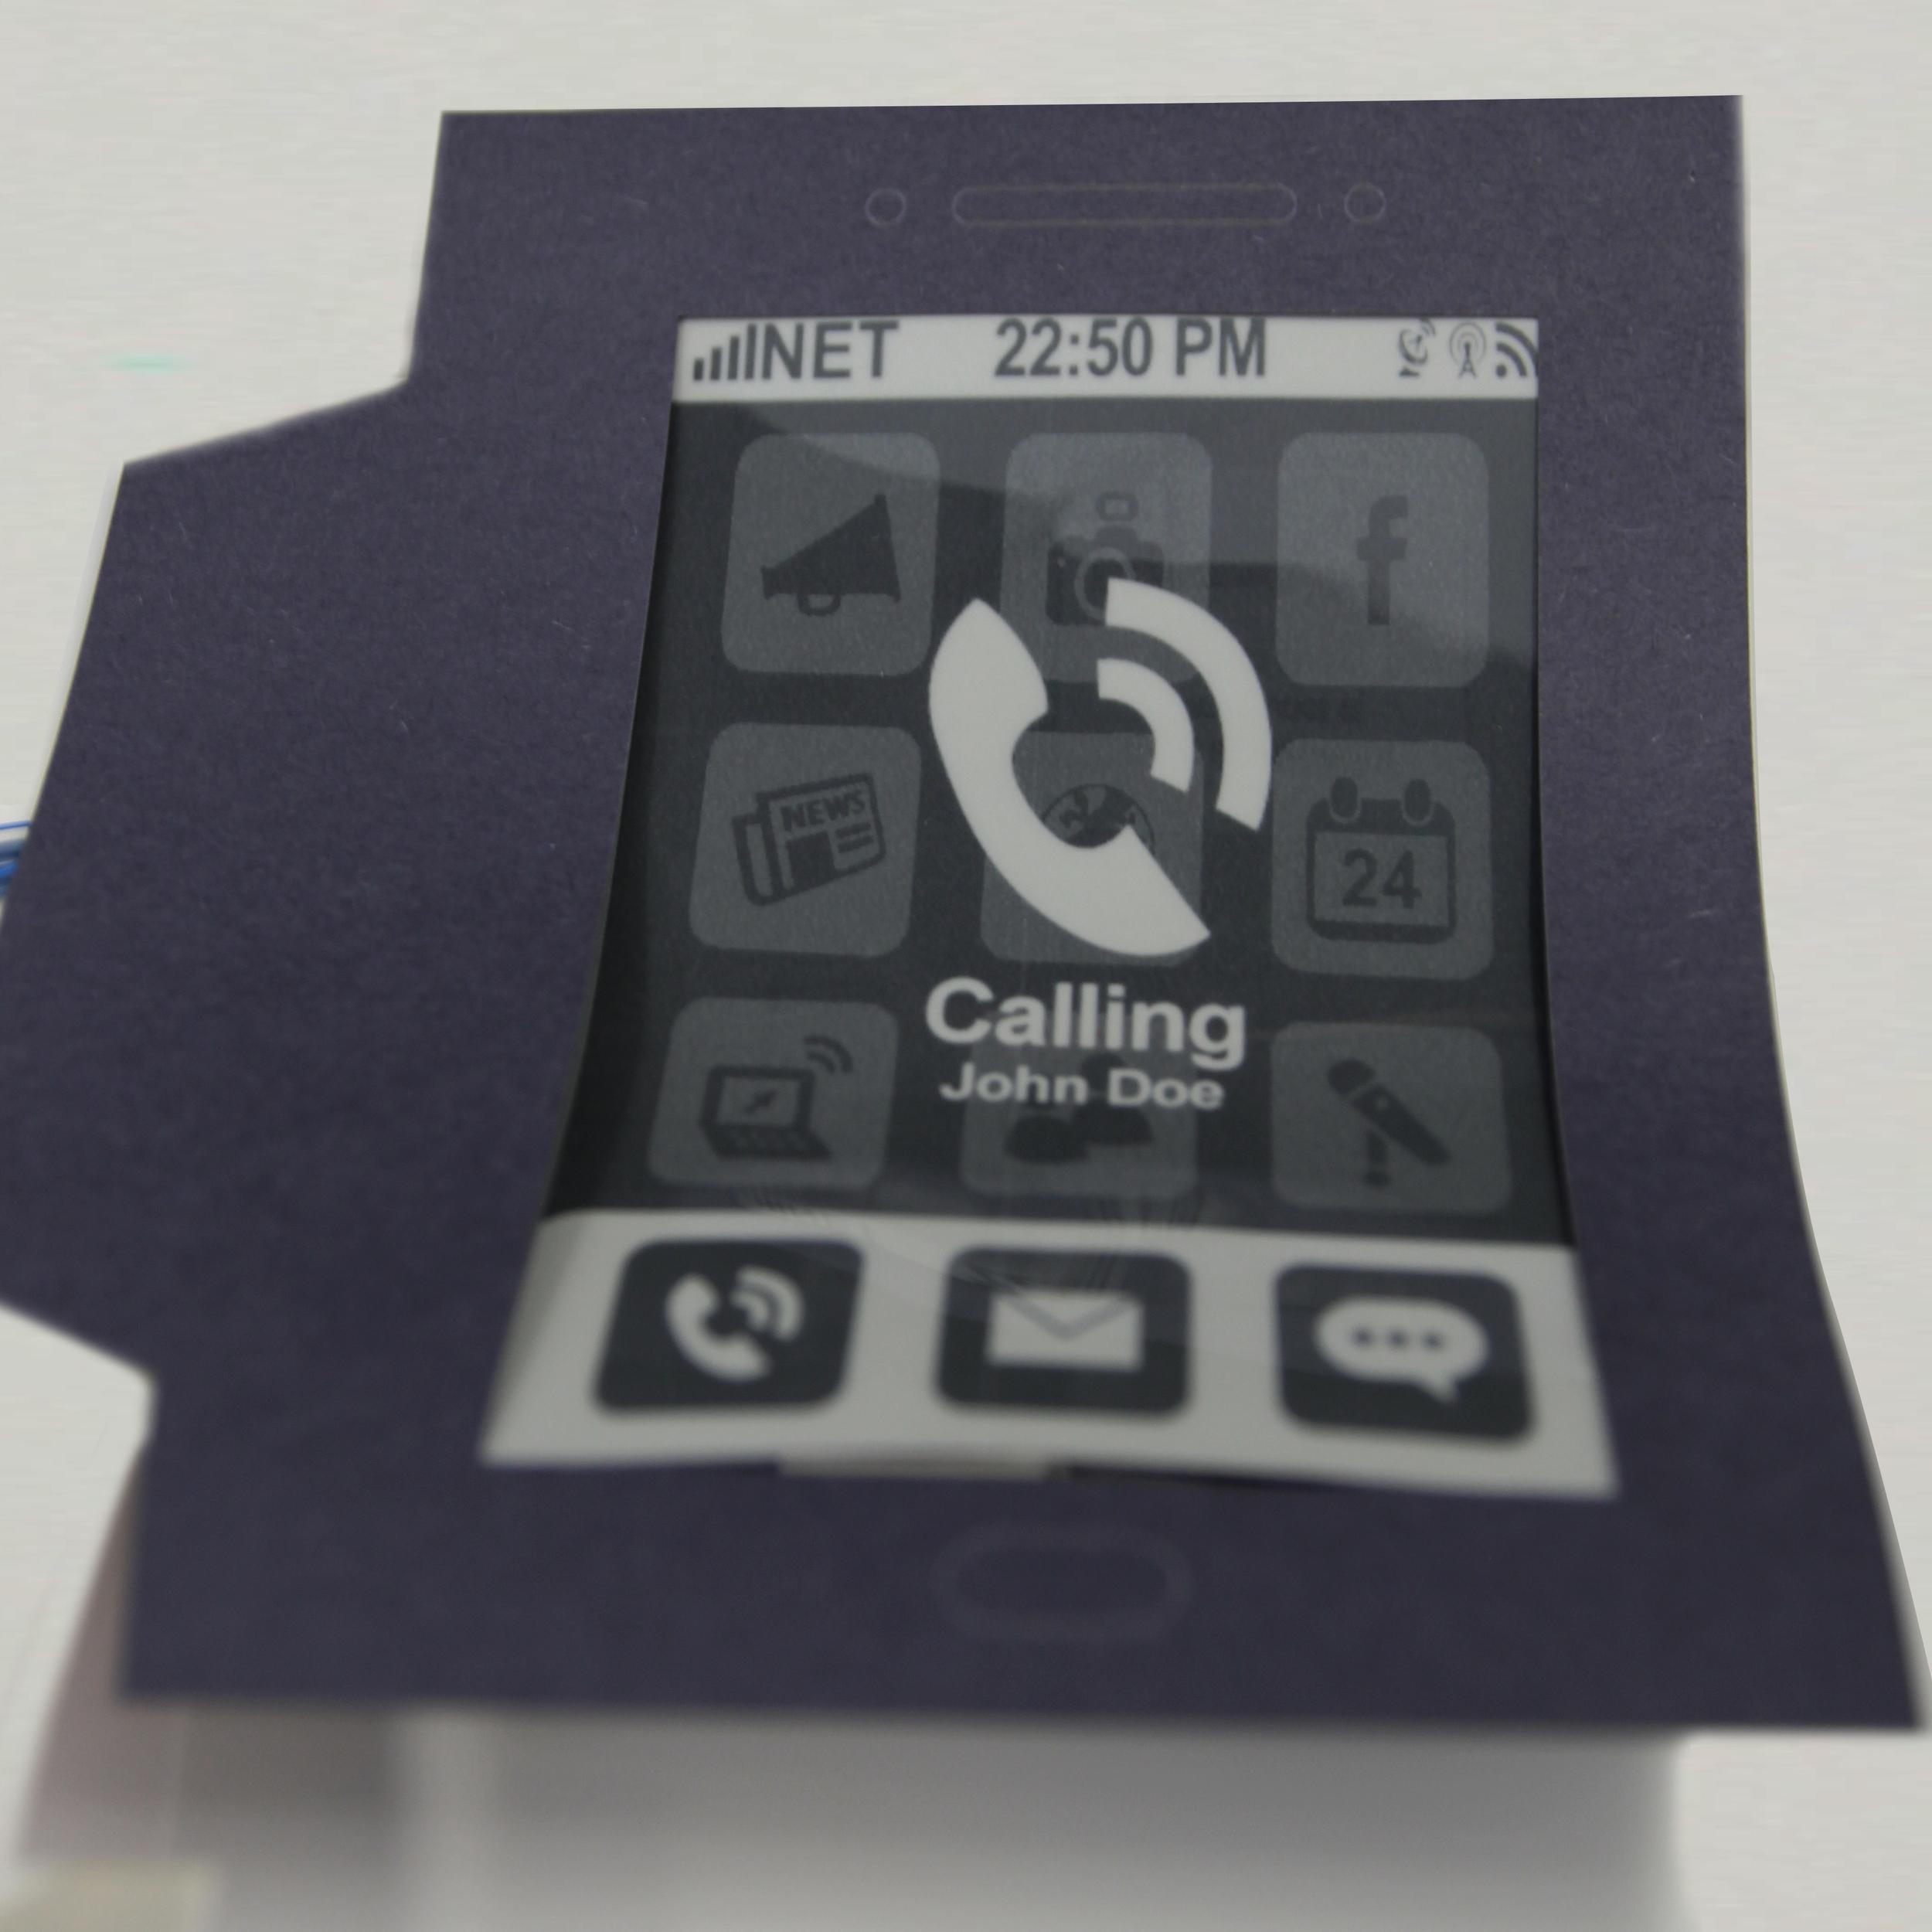 morephone (2013): phone call notification